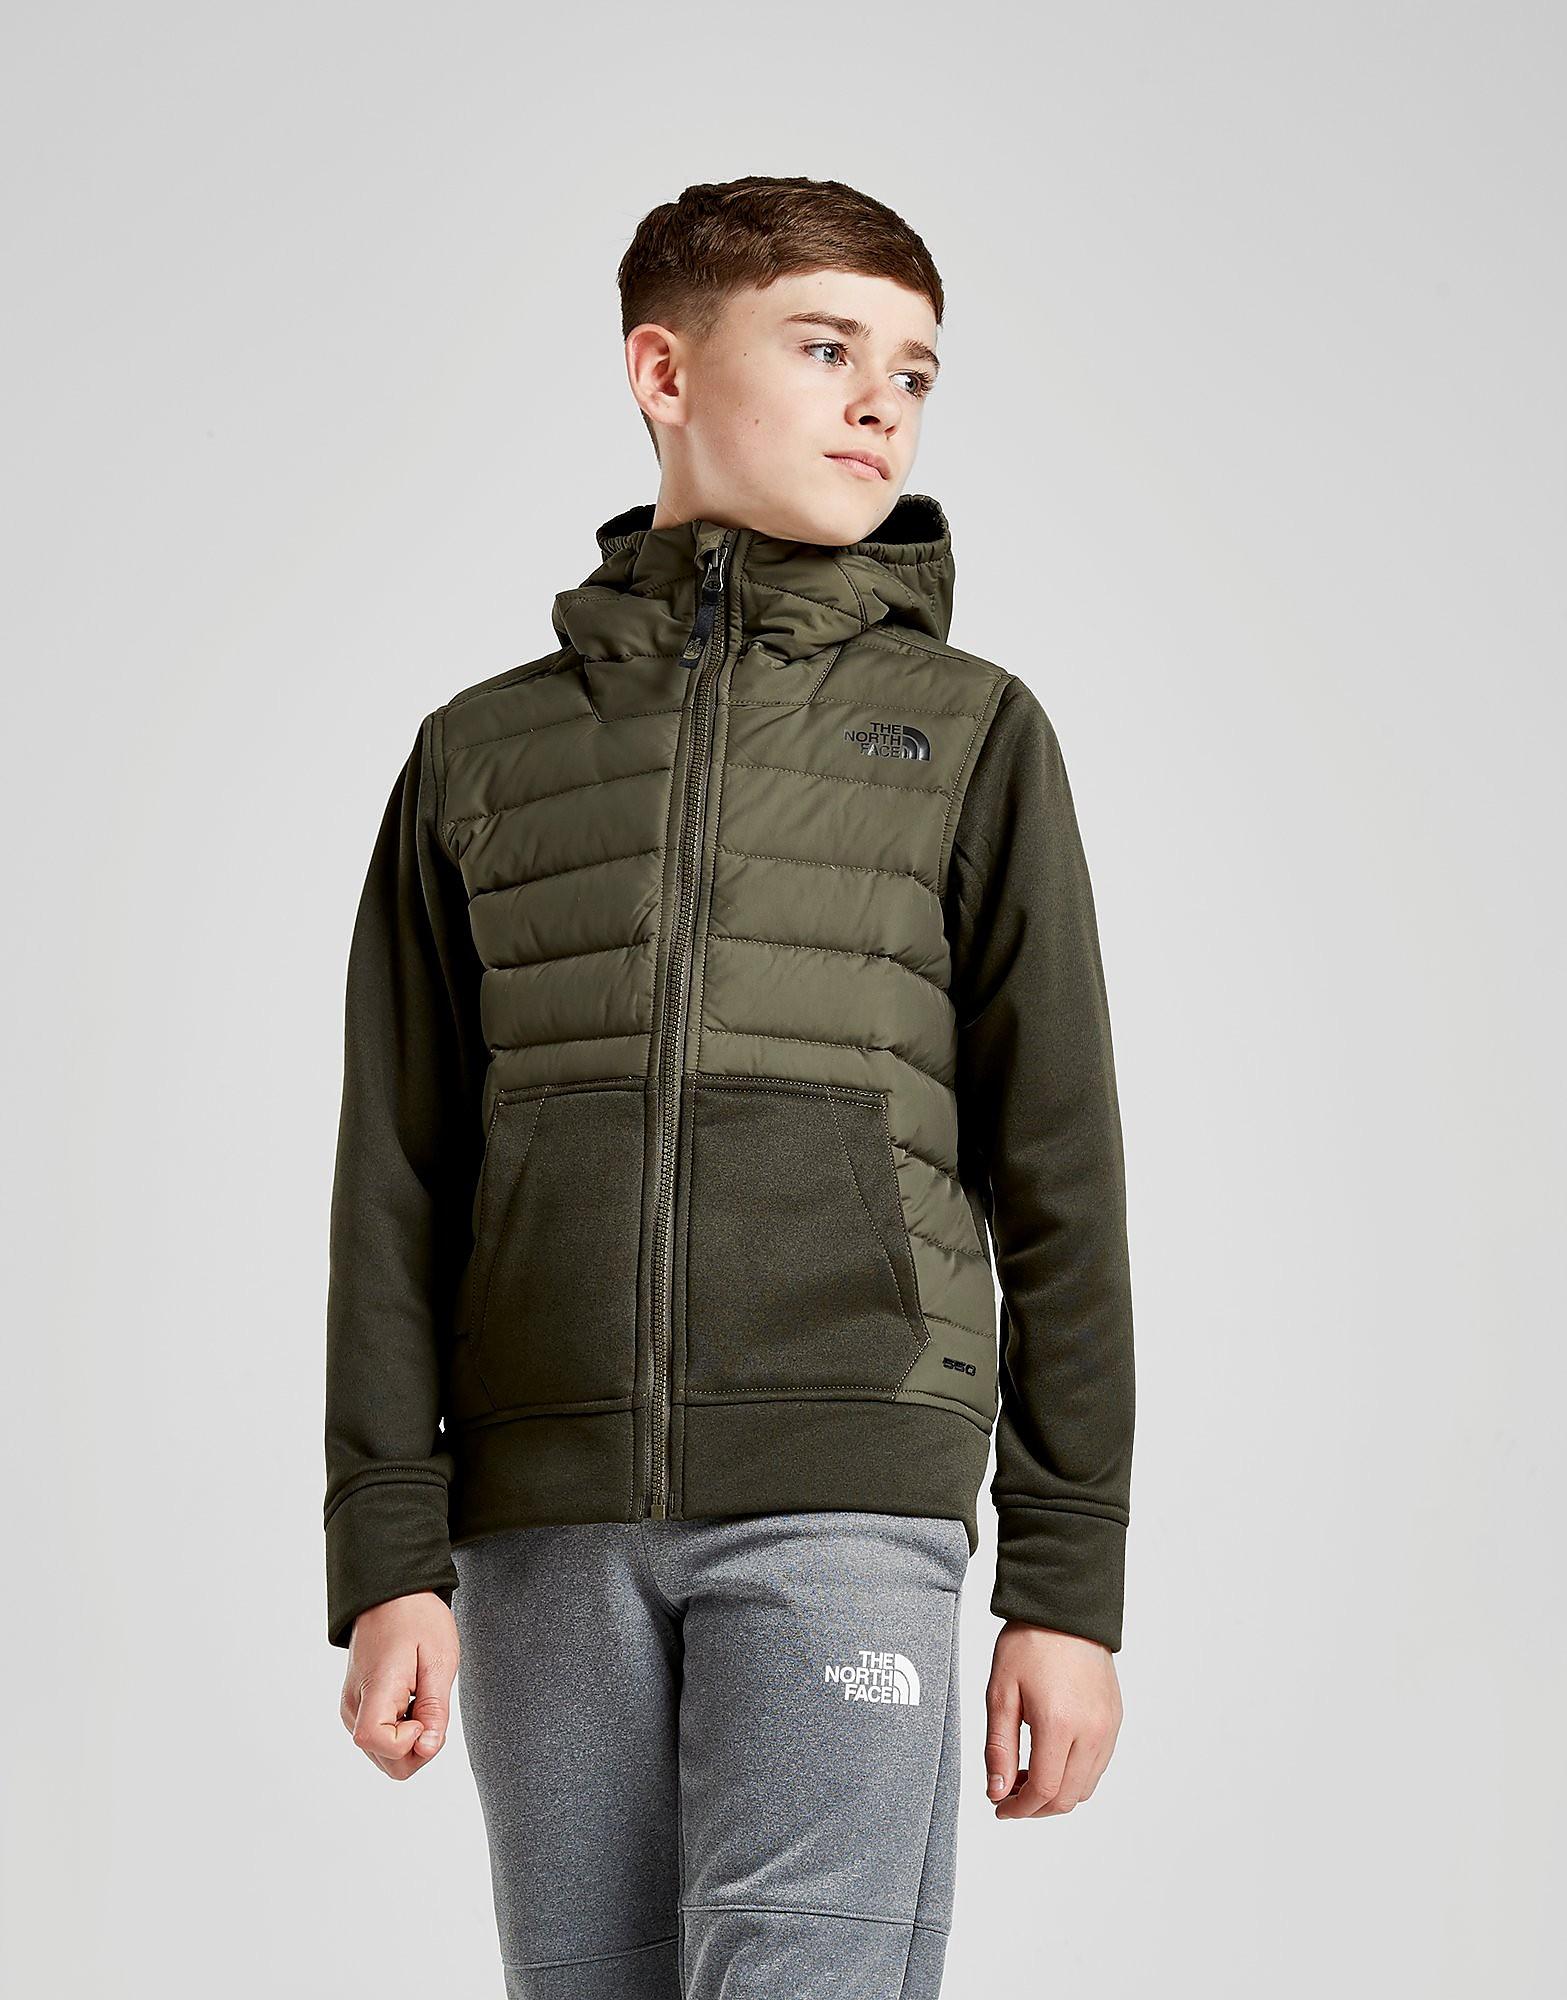 The North Face Mittelegi Hybrid Jacket Junior - Groen - Kind